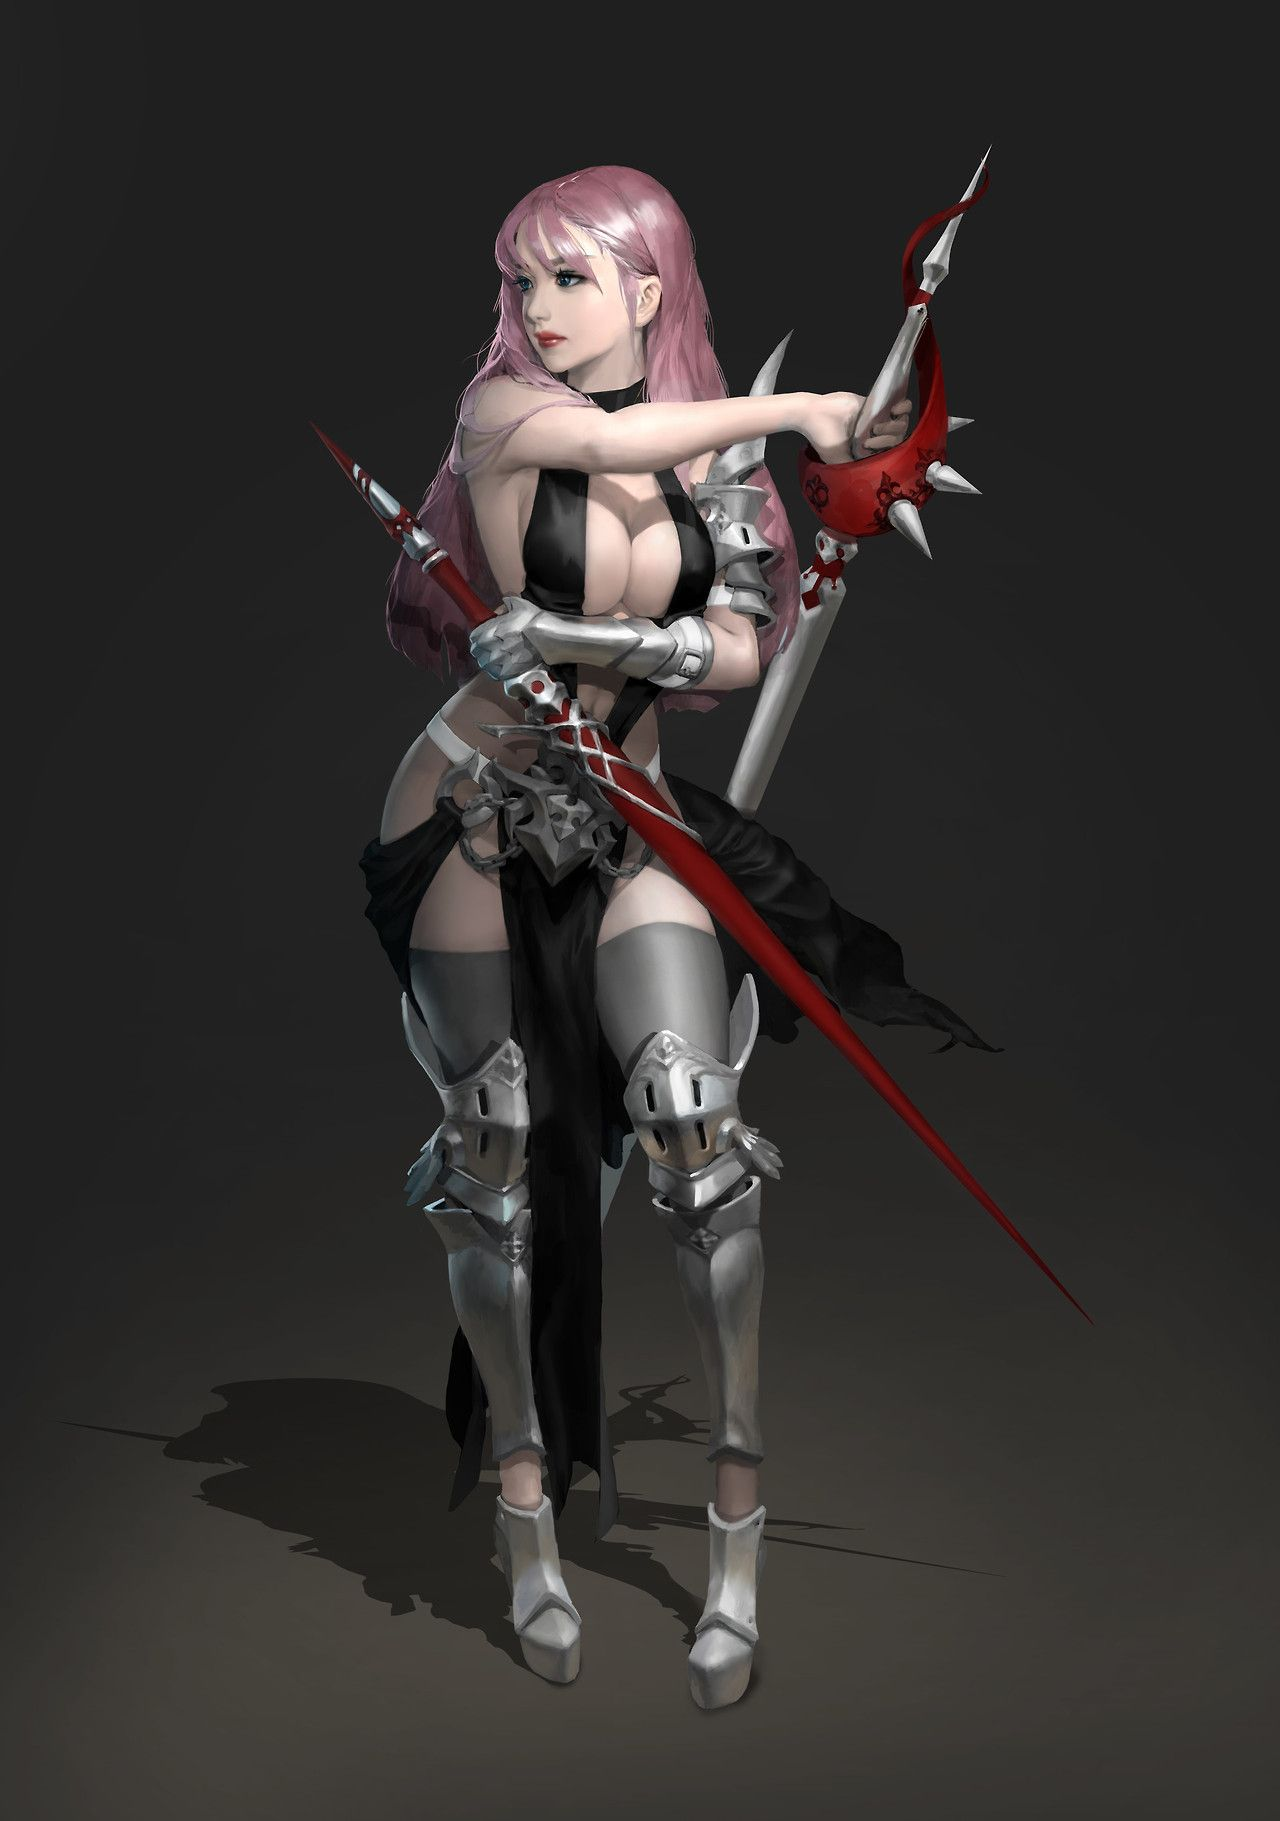 Erotic fantasy armor pics 614